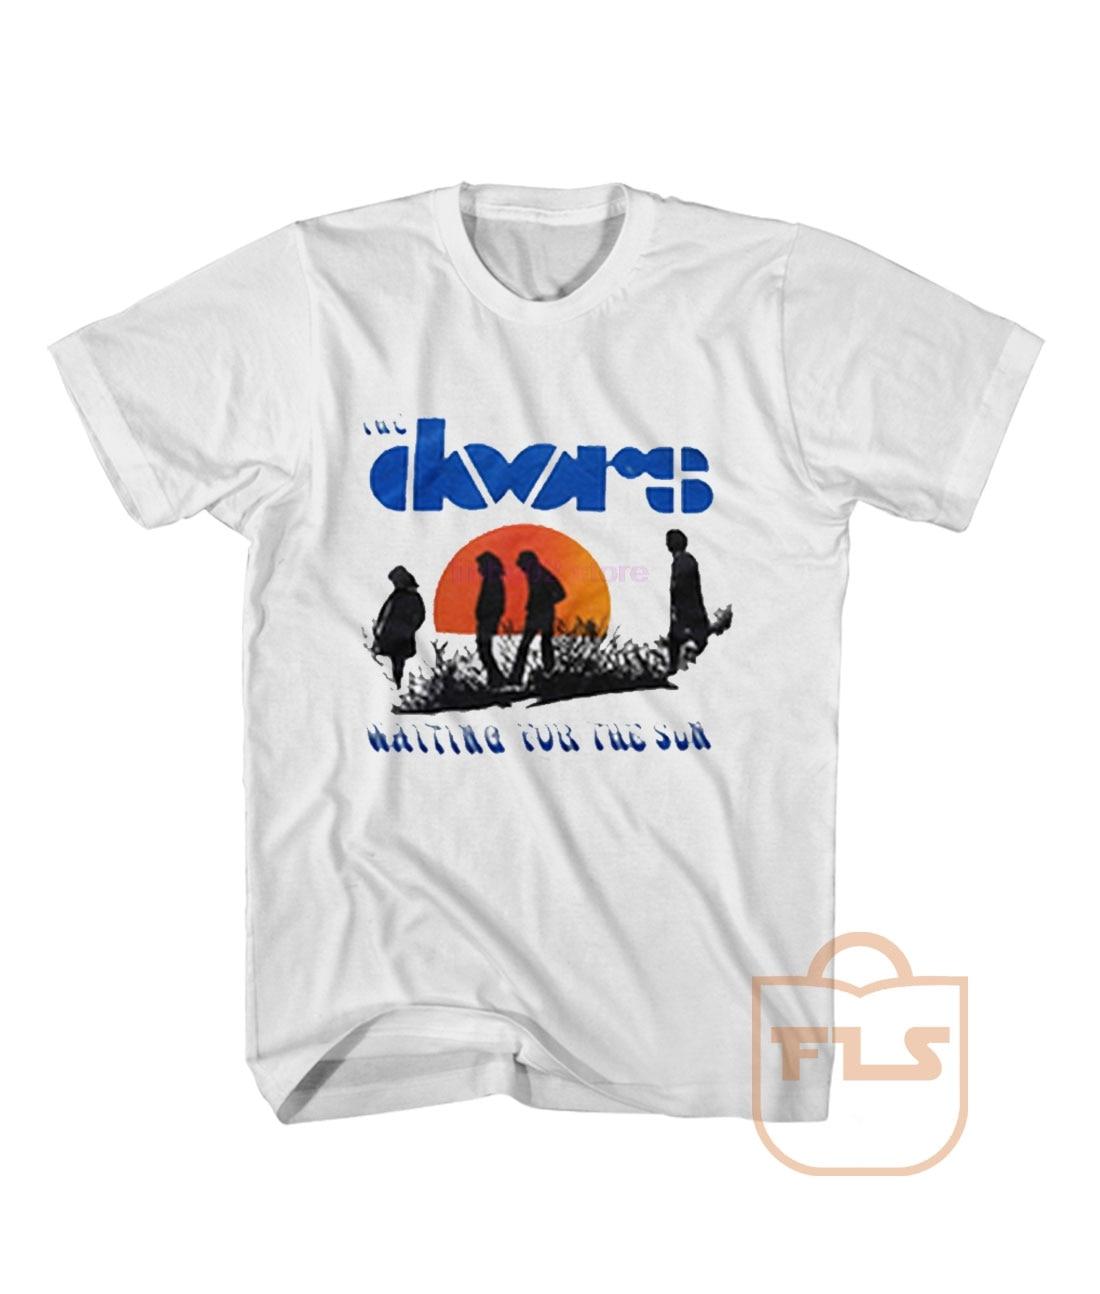 Phiking Doors Waiting For The Sun T Shirt Men's 2019 Summer Style Brand Apparel Casual Men's T-shirt